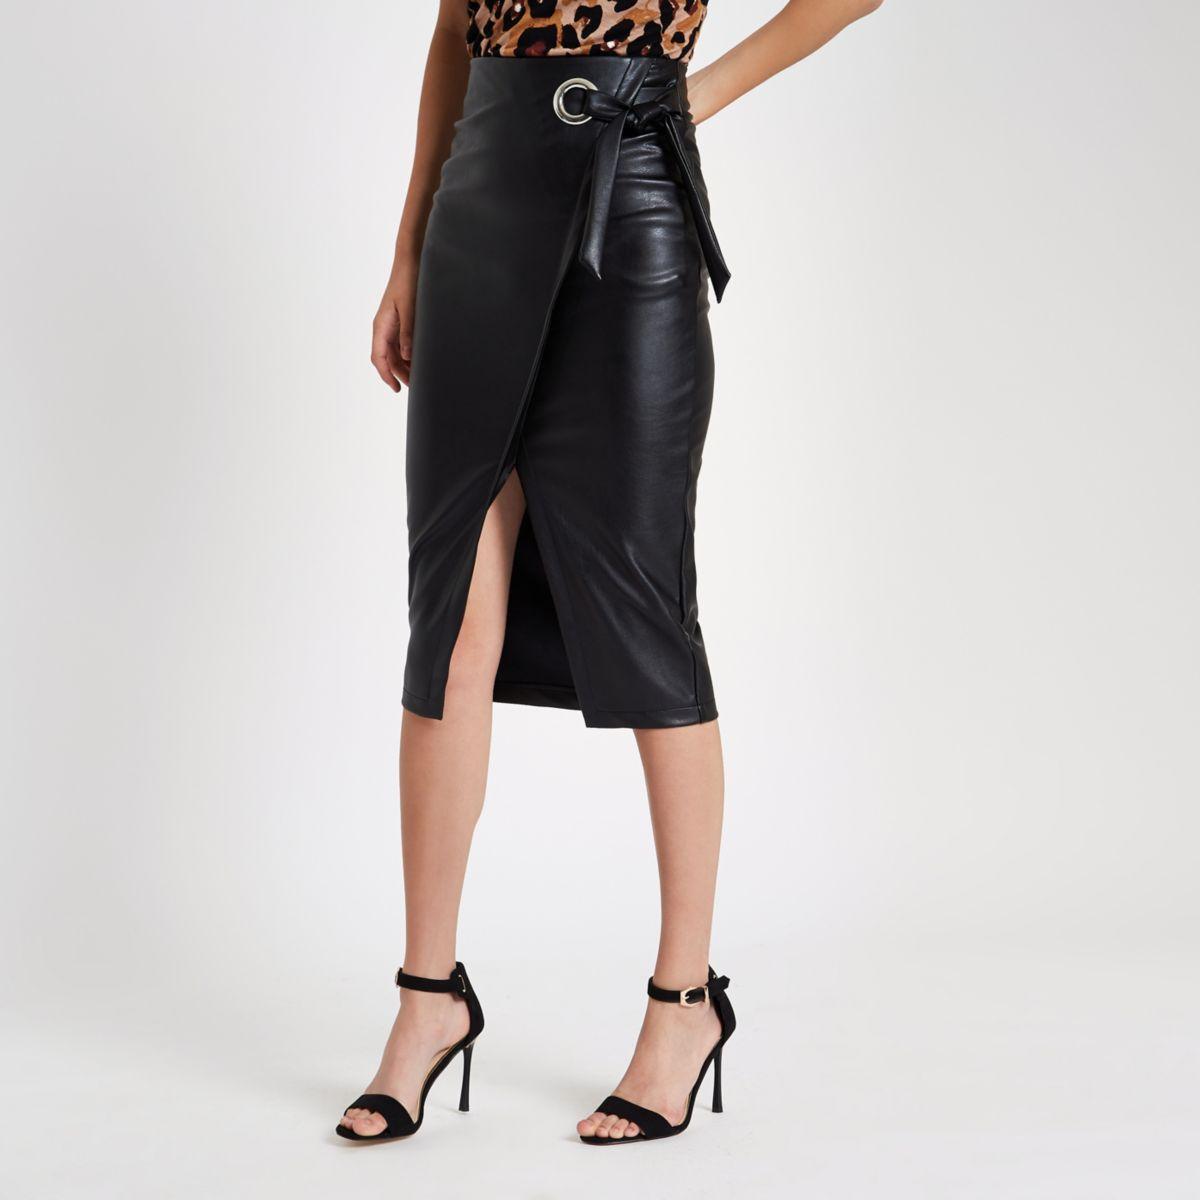 Black faux leather wrap tie-up pencil skirt